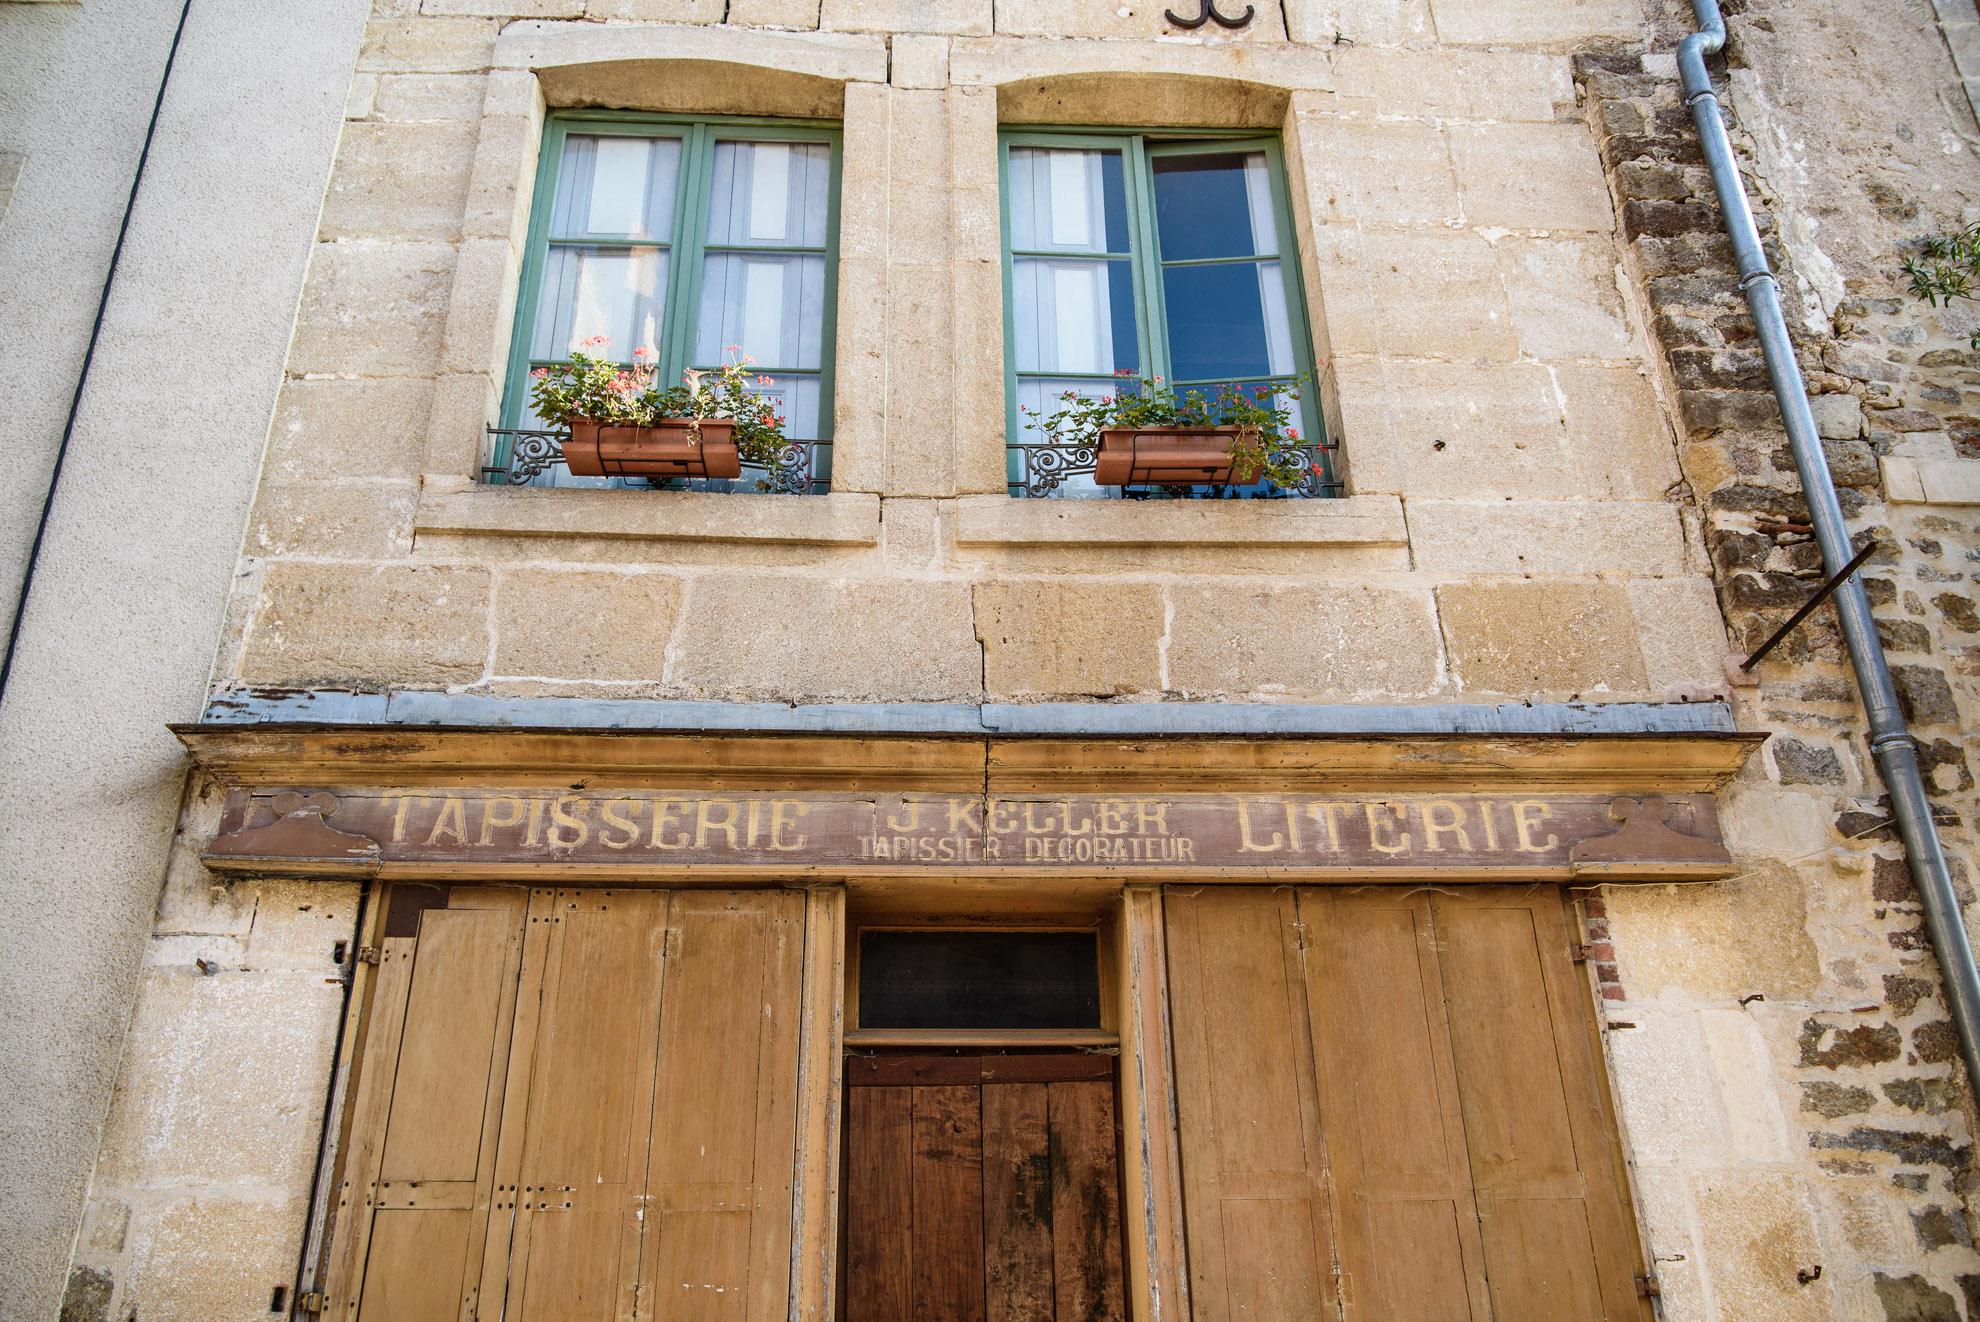 Semur-en-Auxois - zamknięty zakład tkacki